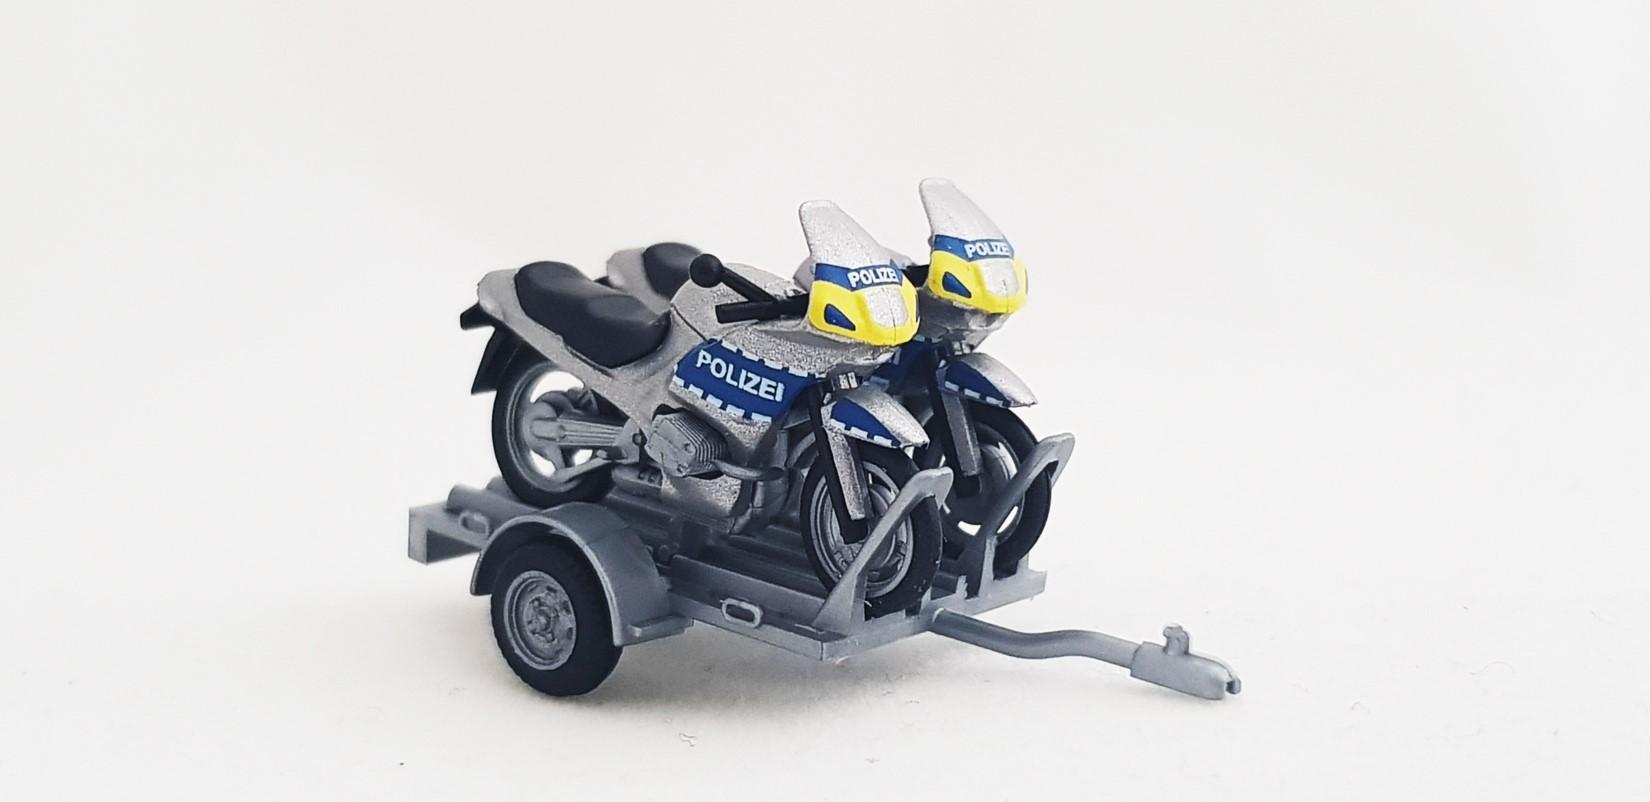 2 bmw motorr der polizei krad auf anh nger landespolizei. Black Bedroom Furniture Sets. Home Design Ideas